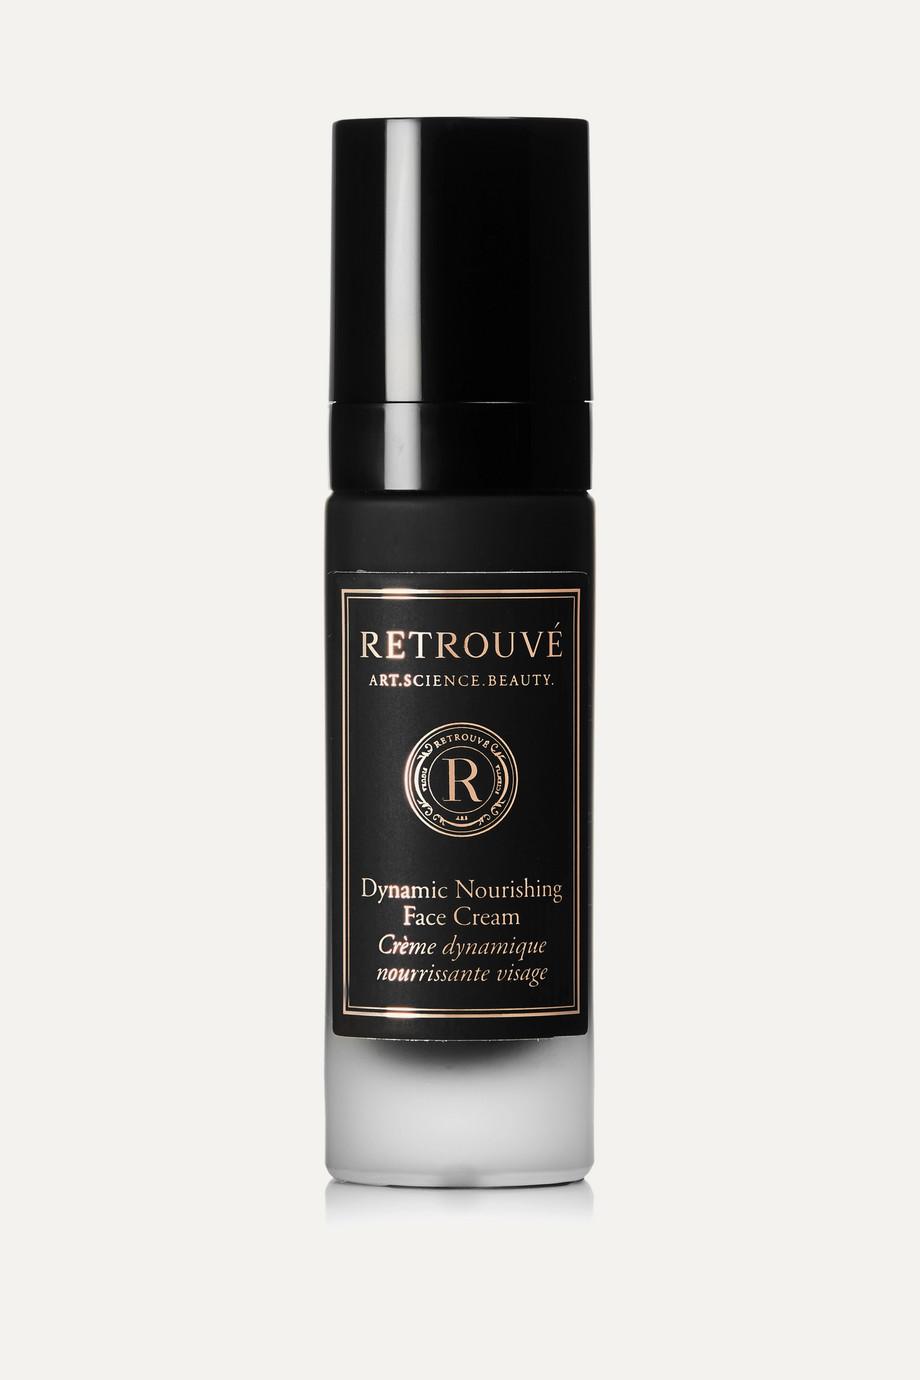 Retrouvé Dynamic Nourishing Face Cream, 30ml